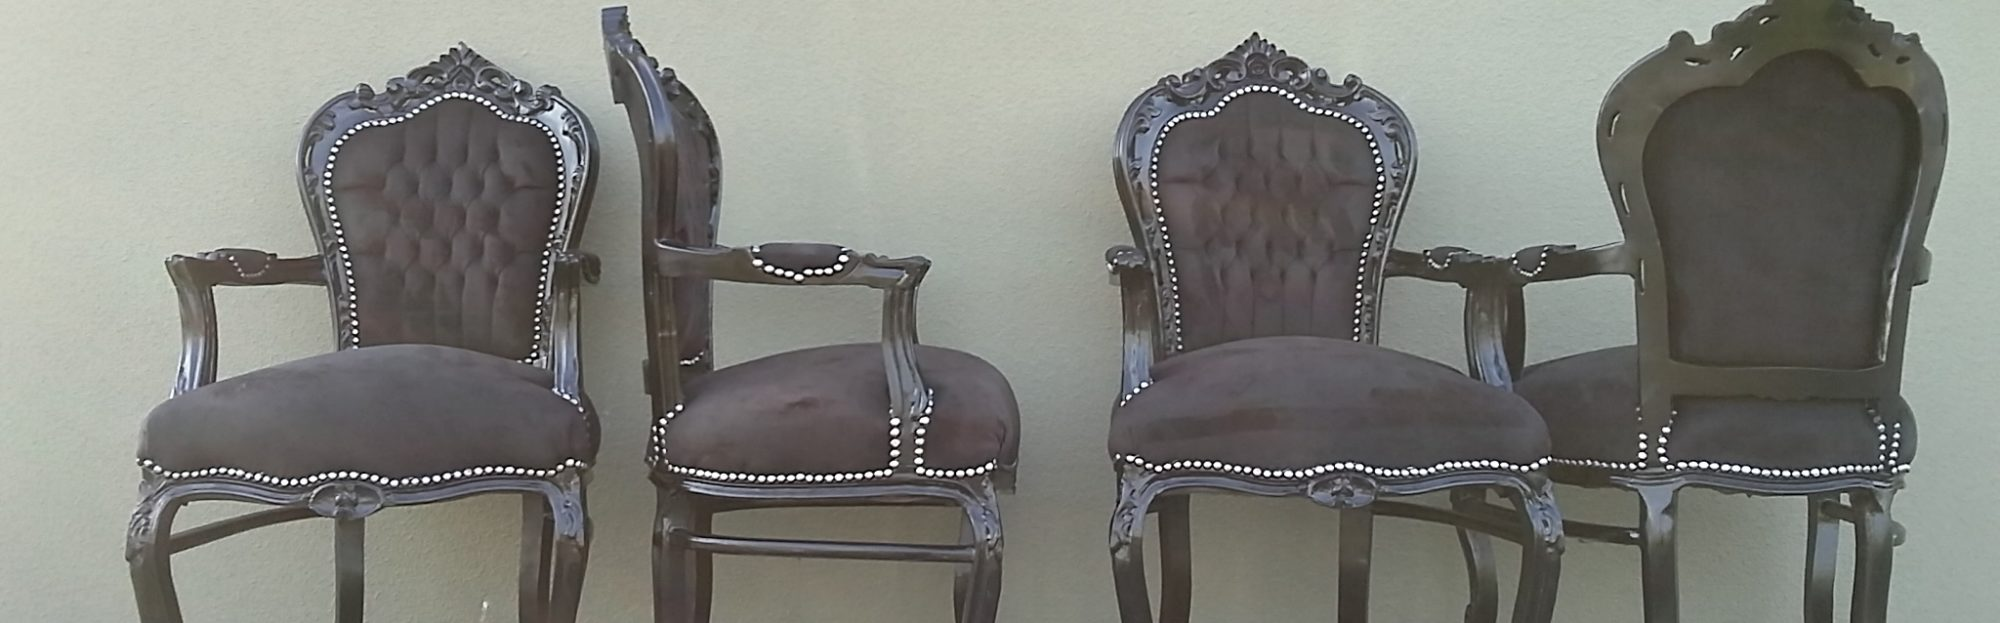 Tedesign.nl -Barok stoelen en barok meubelen